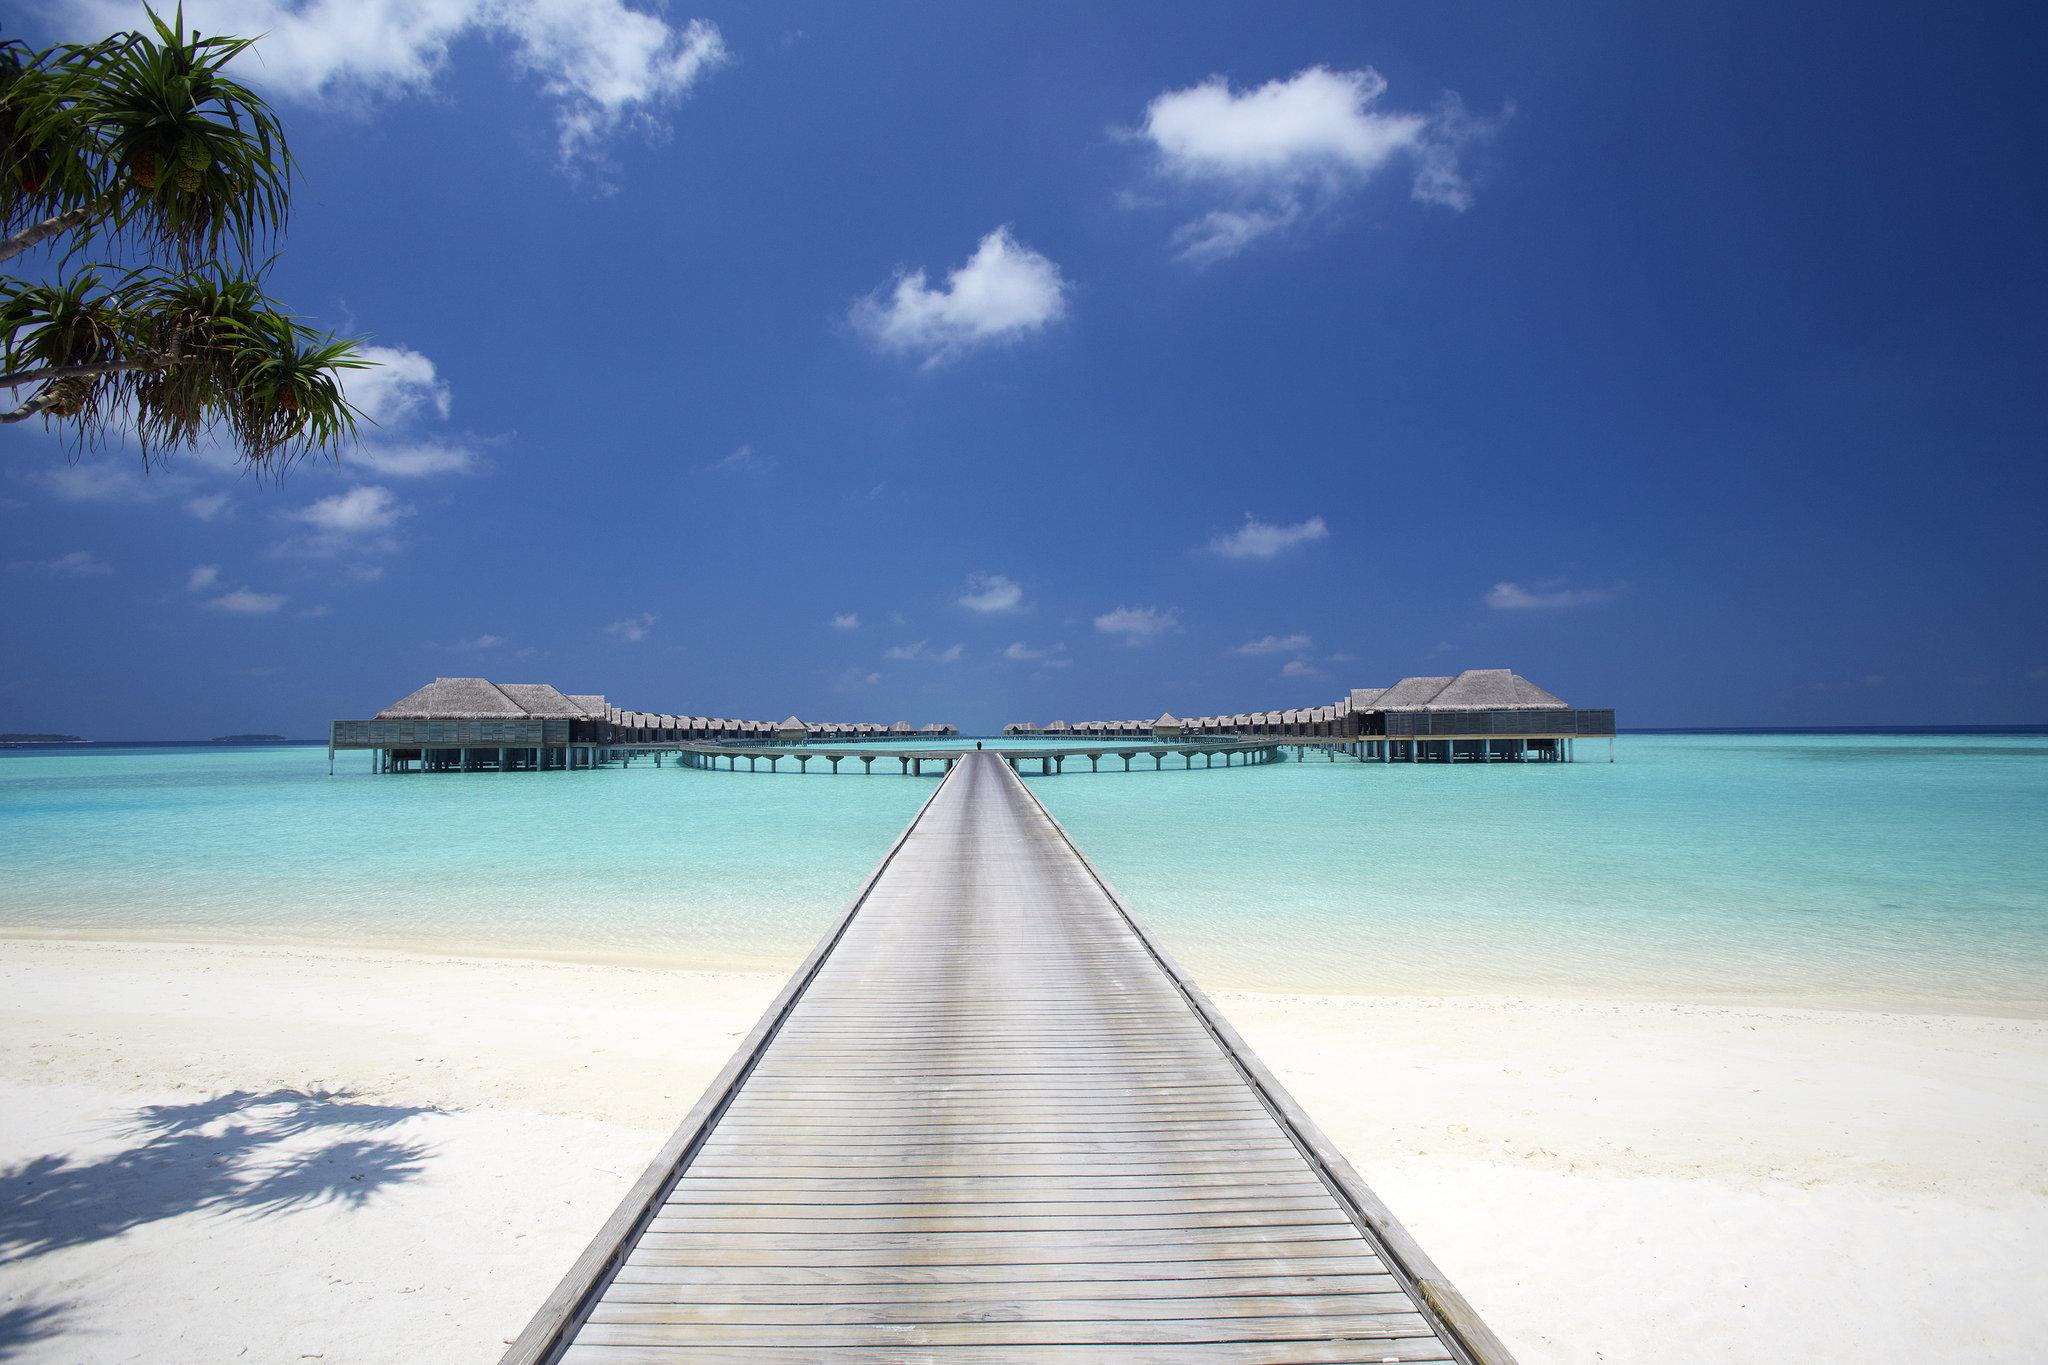 Maldives Anantara Kihavah 11 Villas overwater boardwalk